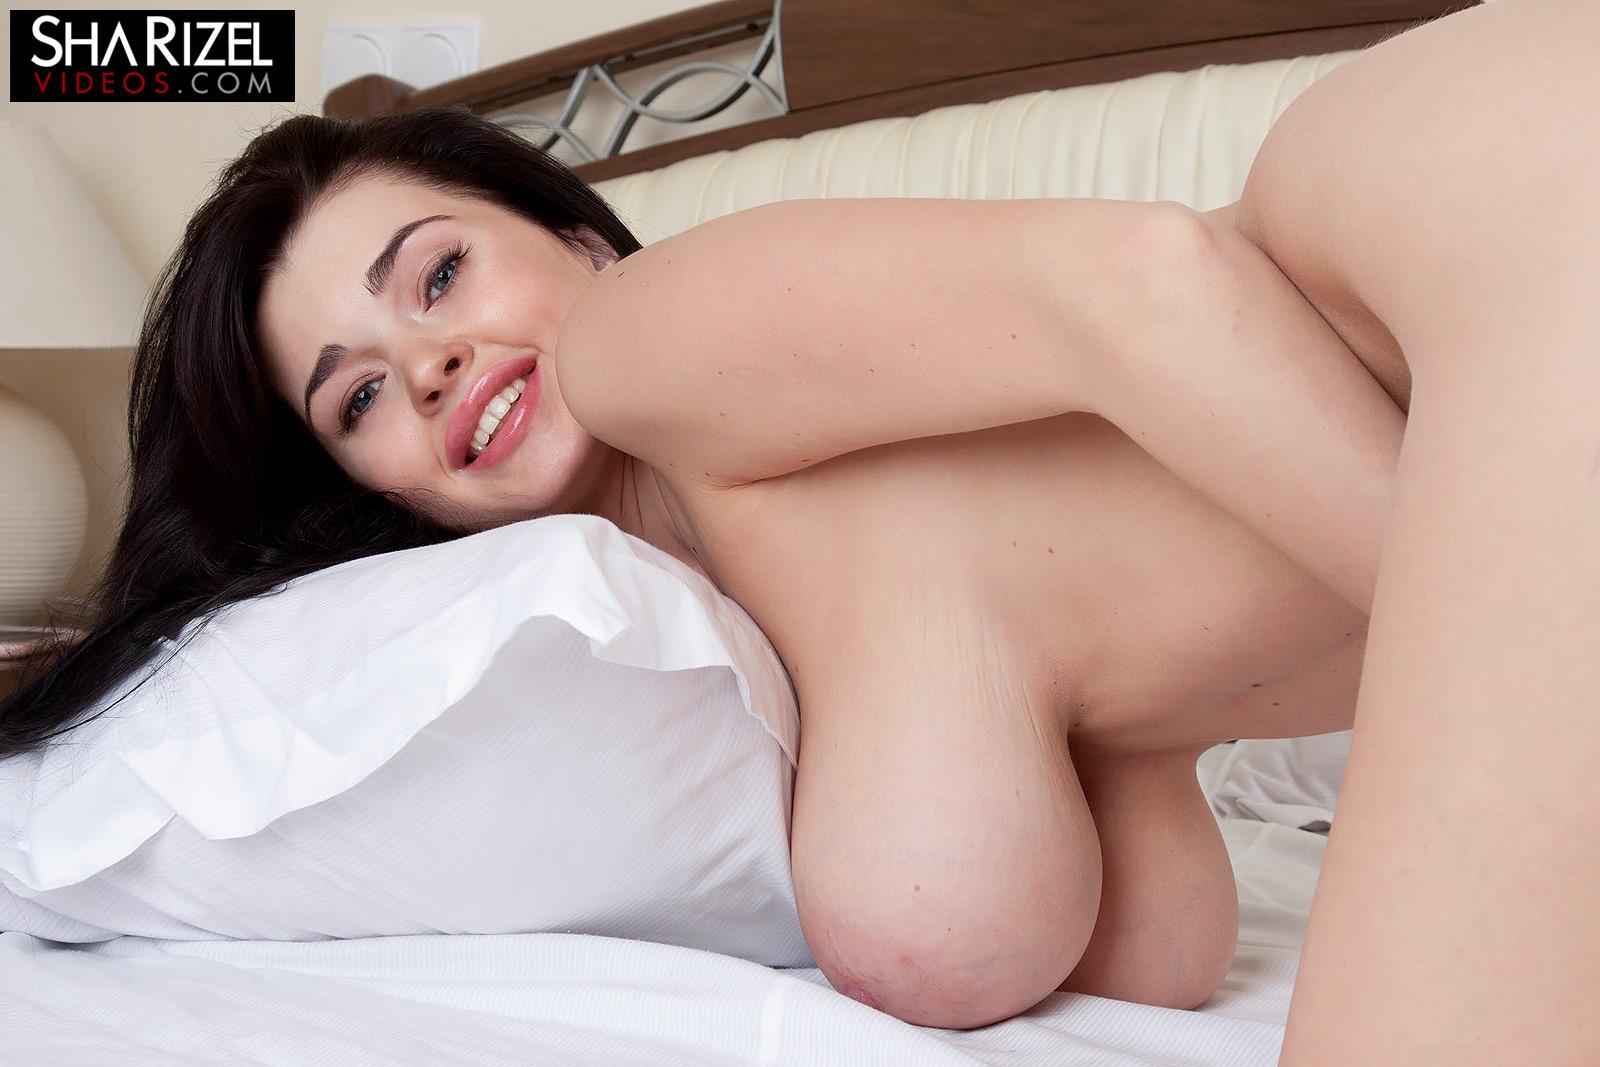 Babe Pic Xxx Porn babe today sha rizel videos sha rizel bath mobile xxx » wife